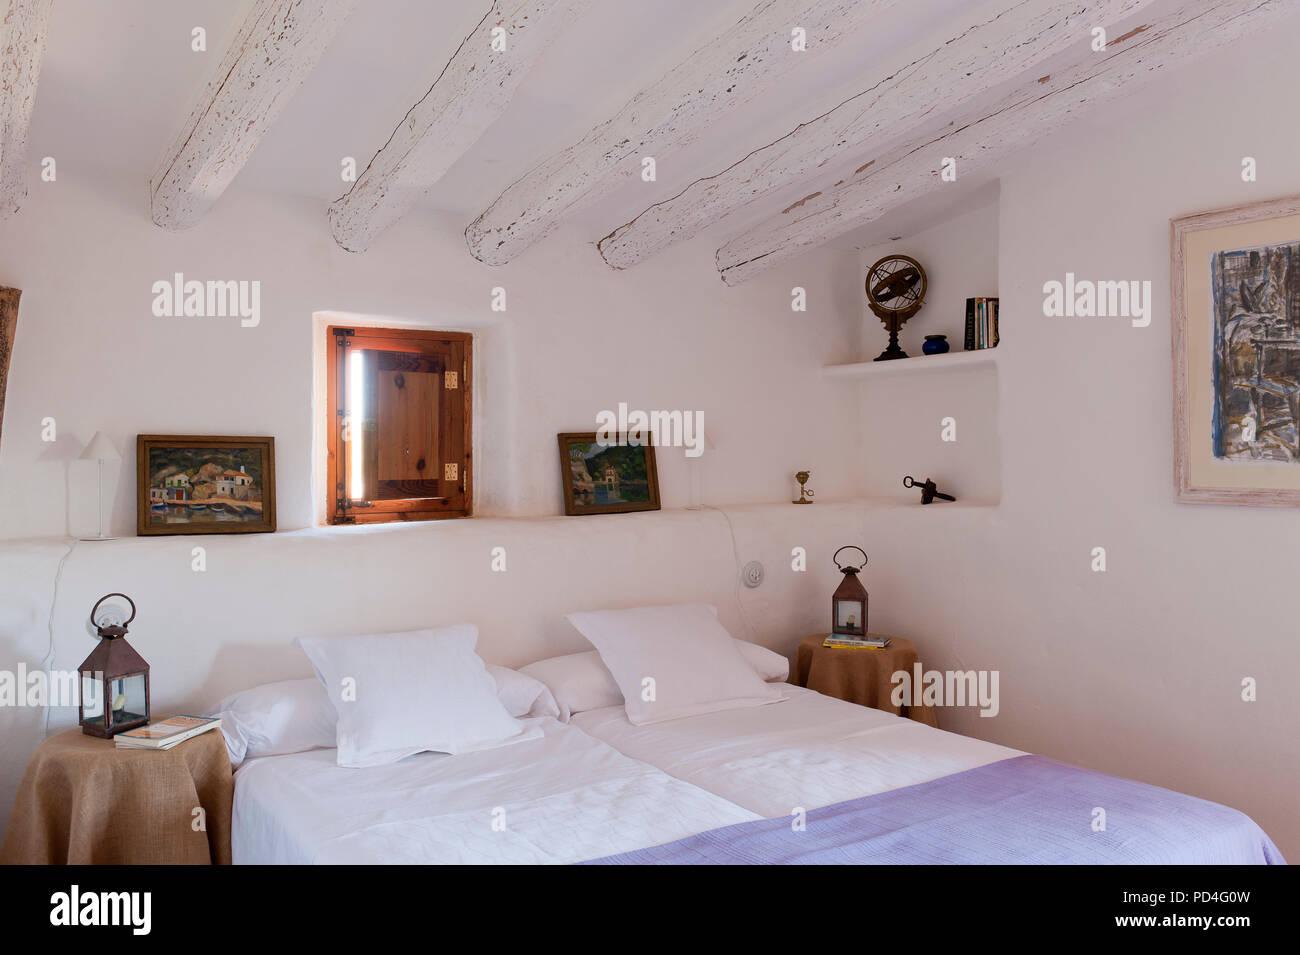 Rustikales Schlafzimmer Stockfoto, Bild: 214615321 - Alamy